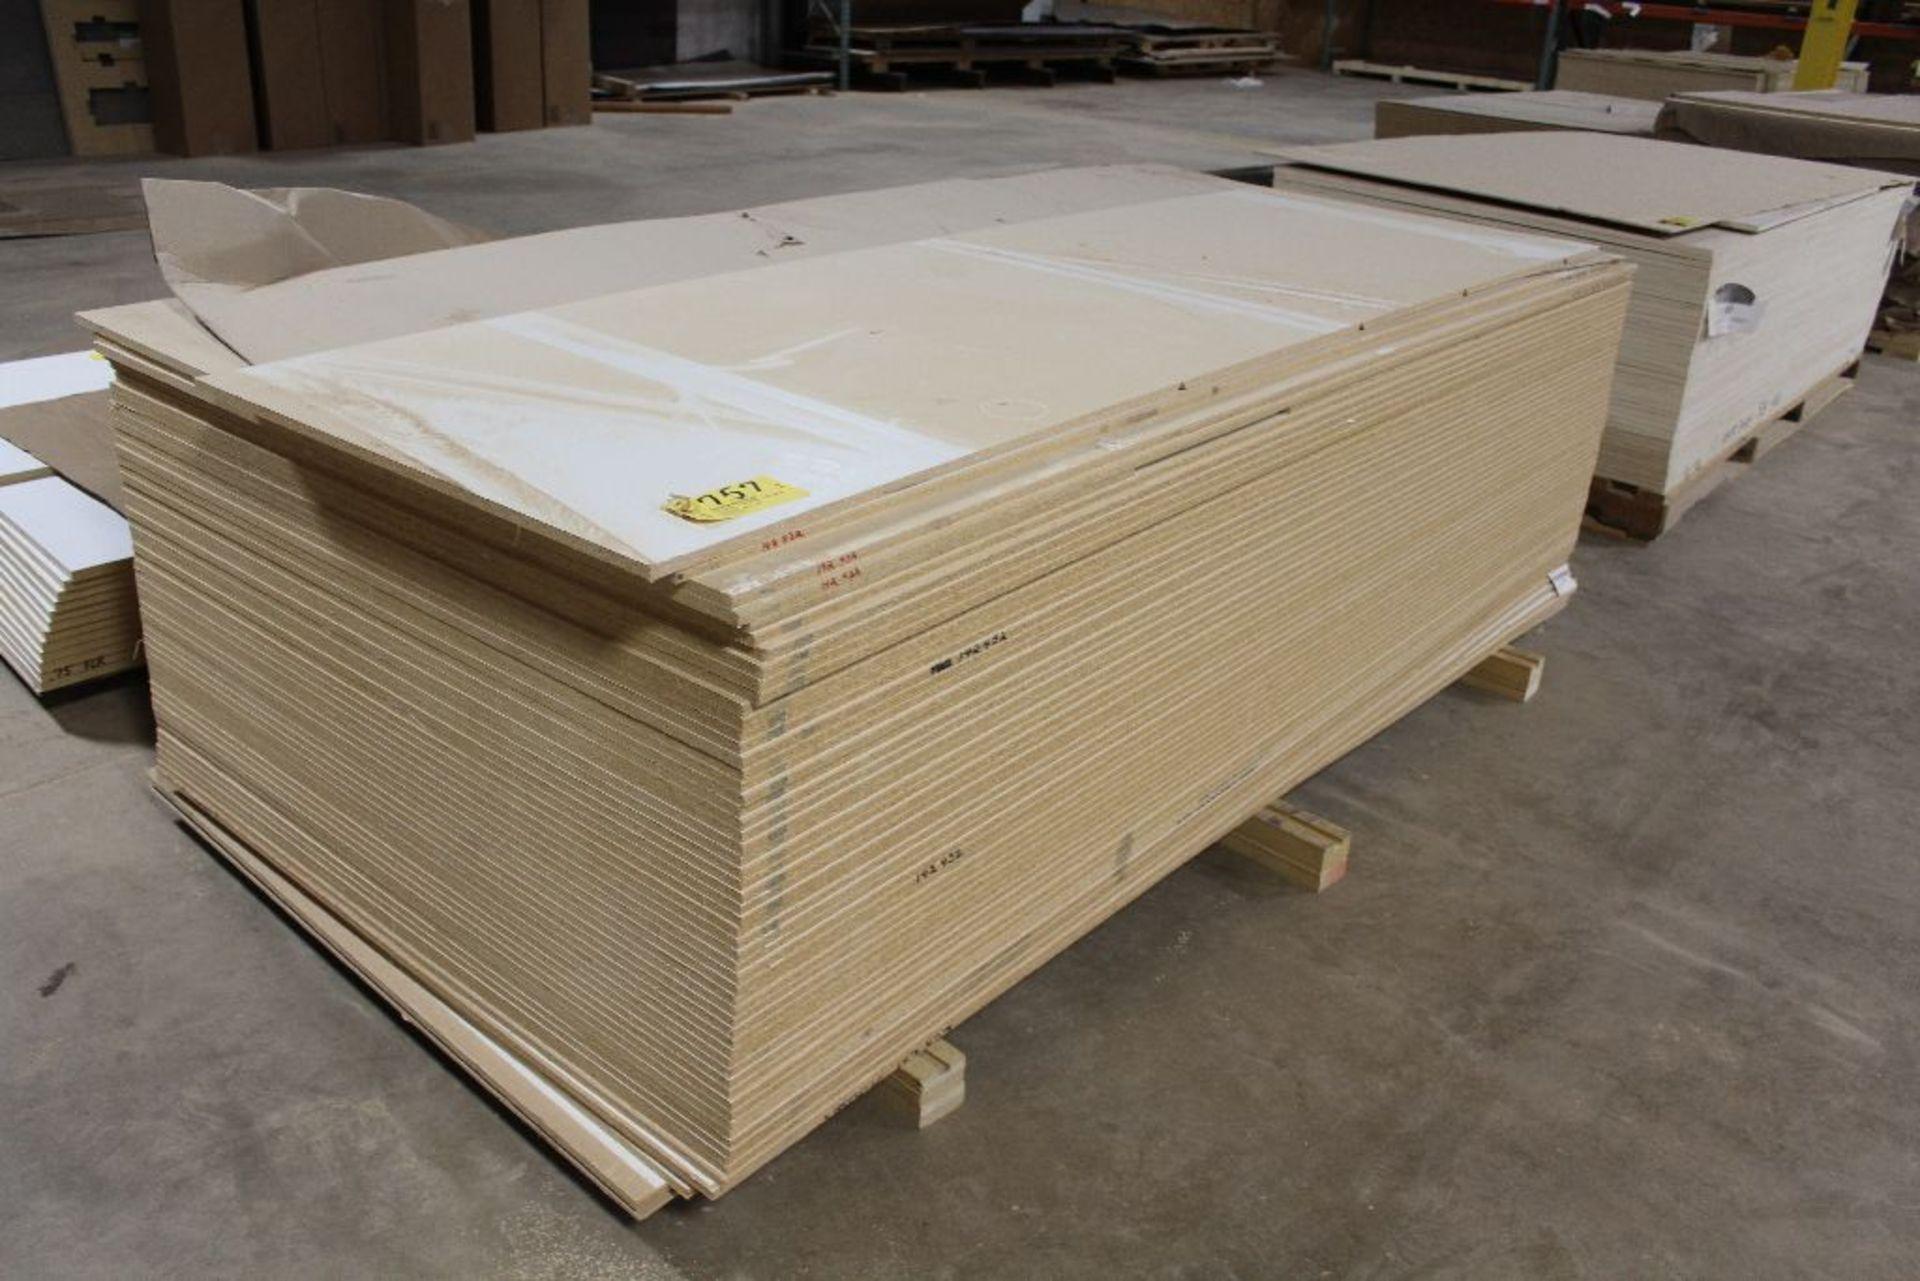 "Lot 757 - Lumber, (61) Vinyl PB white 2 sided, 1/2"" x 49"" x 97""."